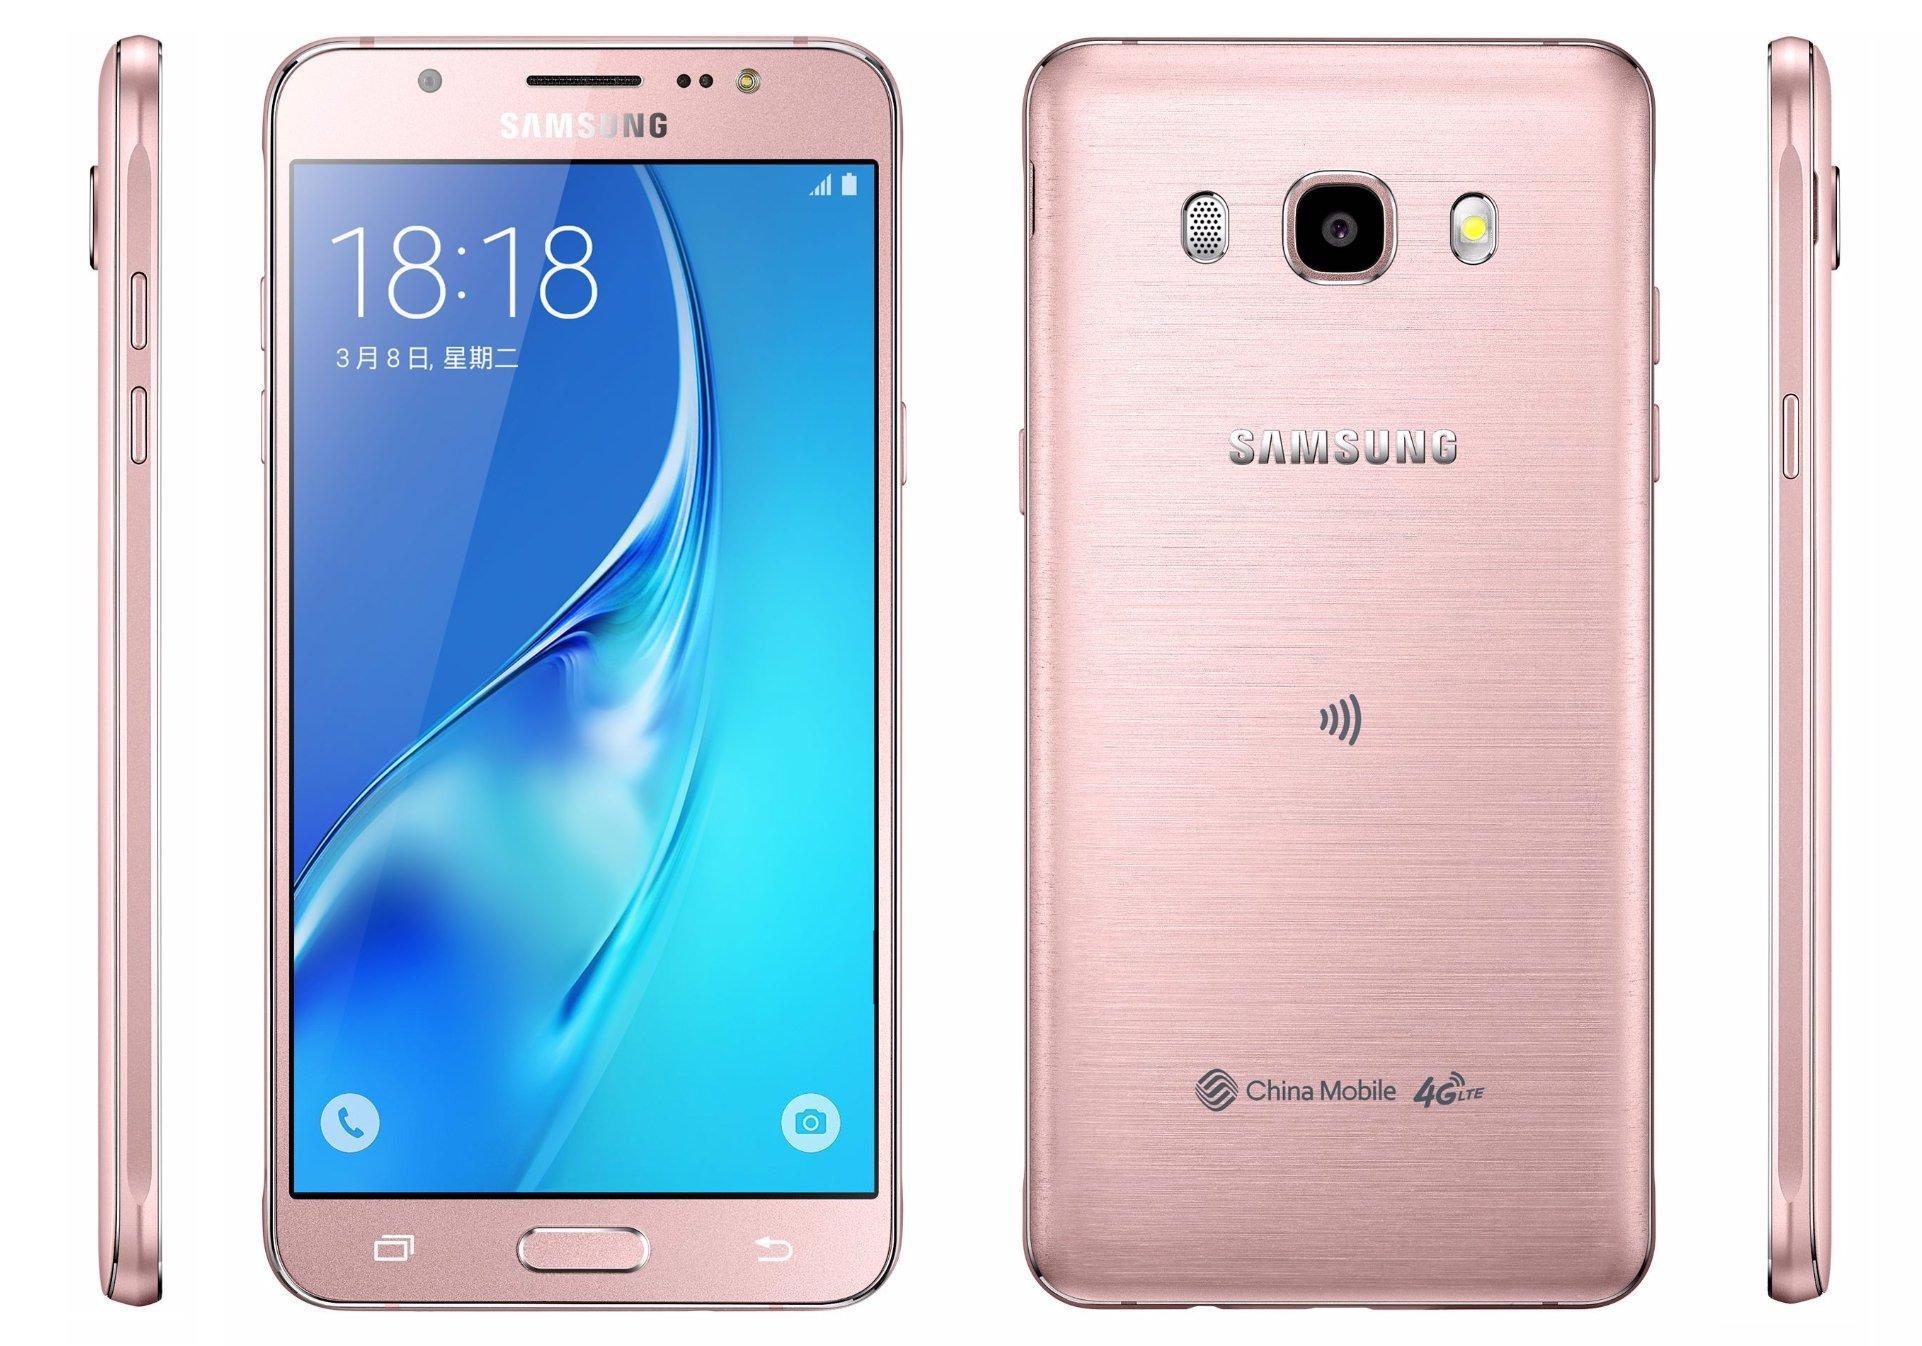 Samsung Galaxy J5 2016 Özellikleri - TeknoVudu